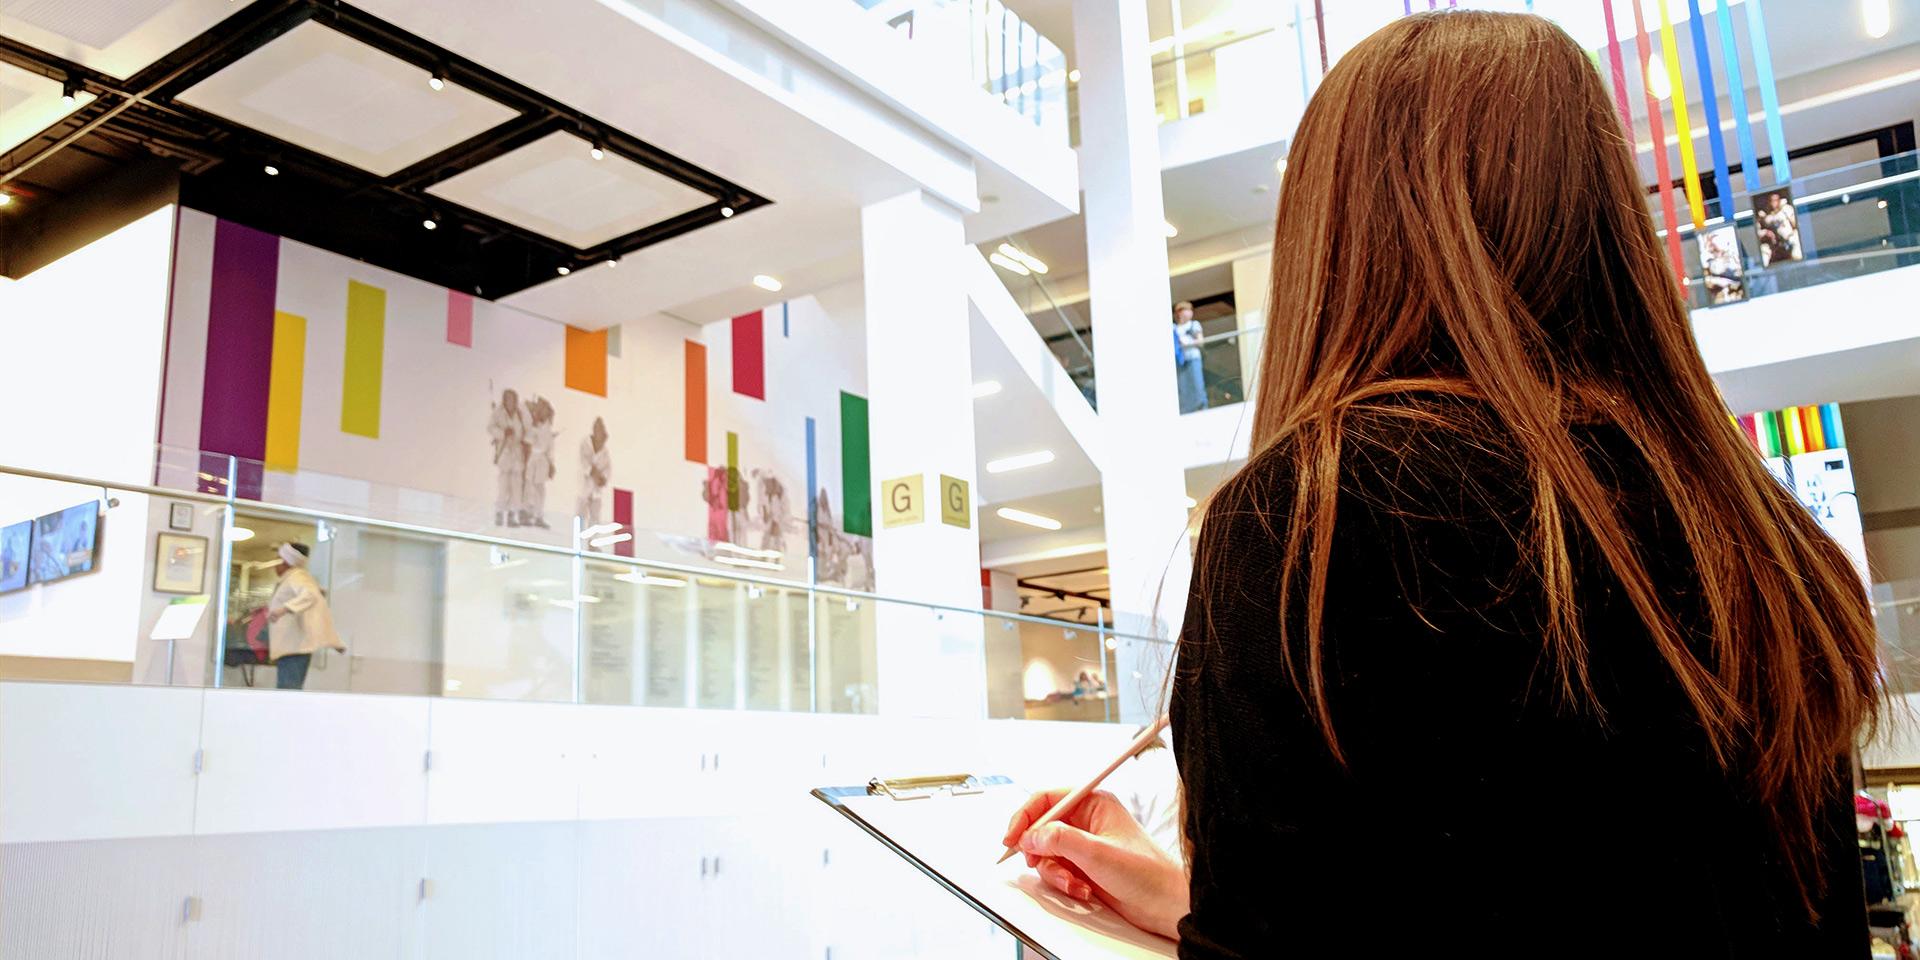 Visitor sketching museum